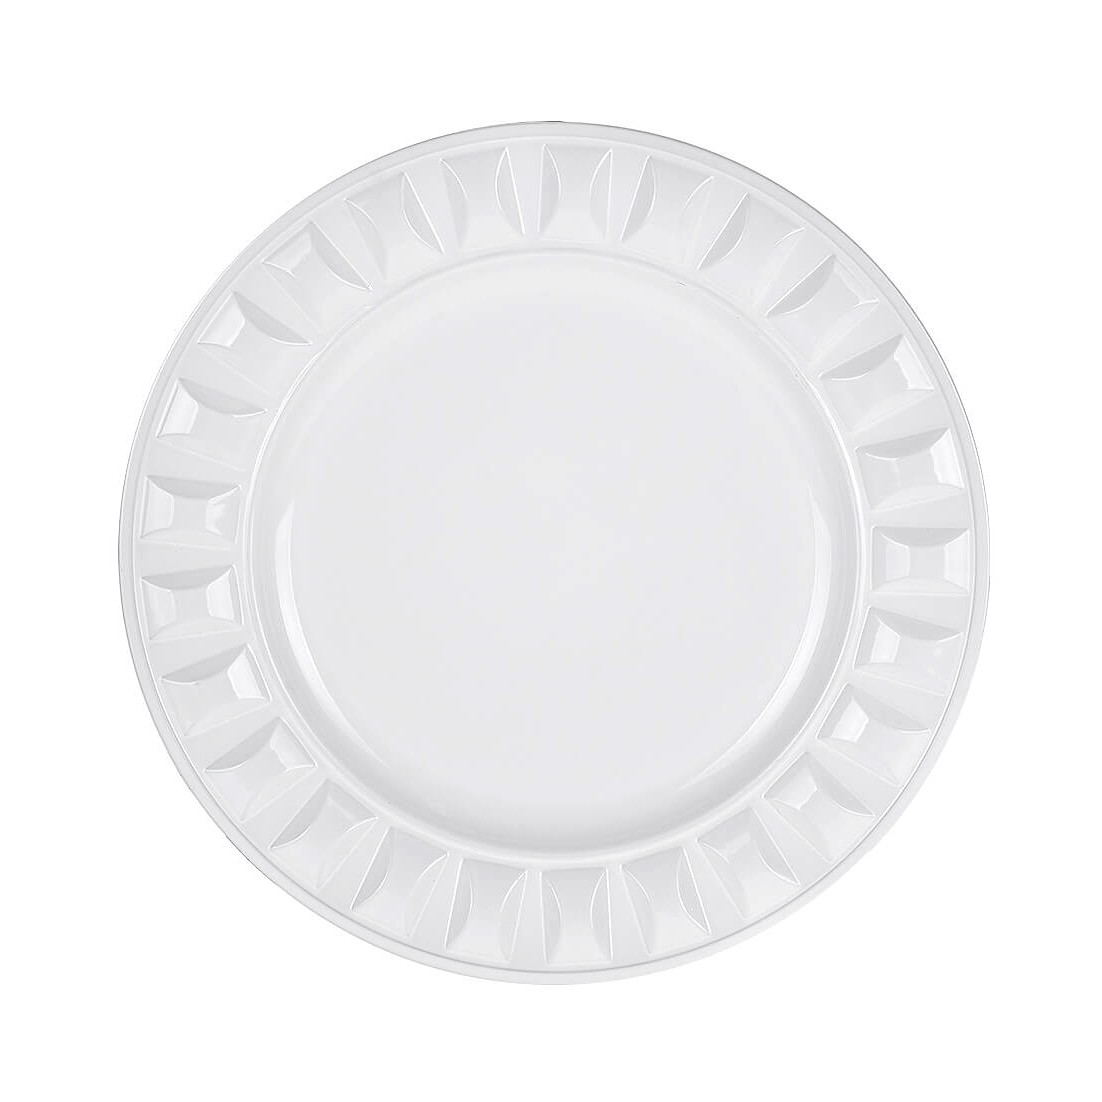 Sousplat Redondo Plastico 33cm Branco 44615-008 - G Presentes